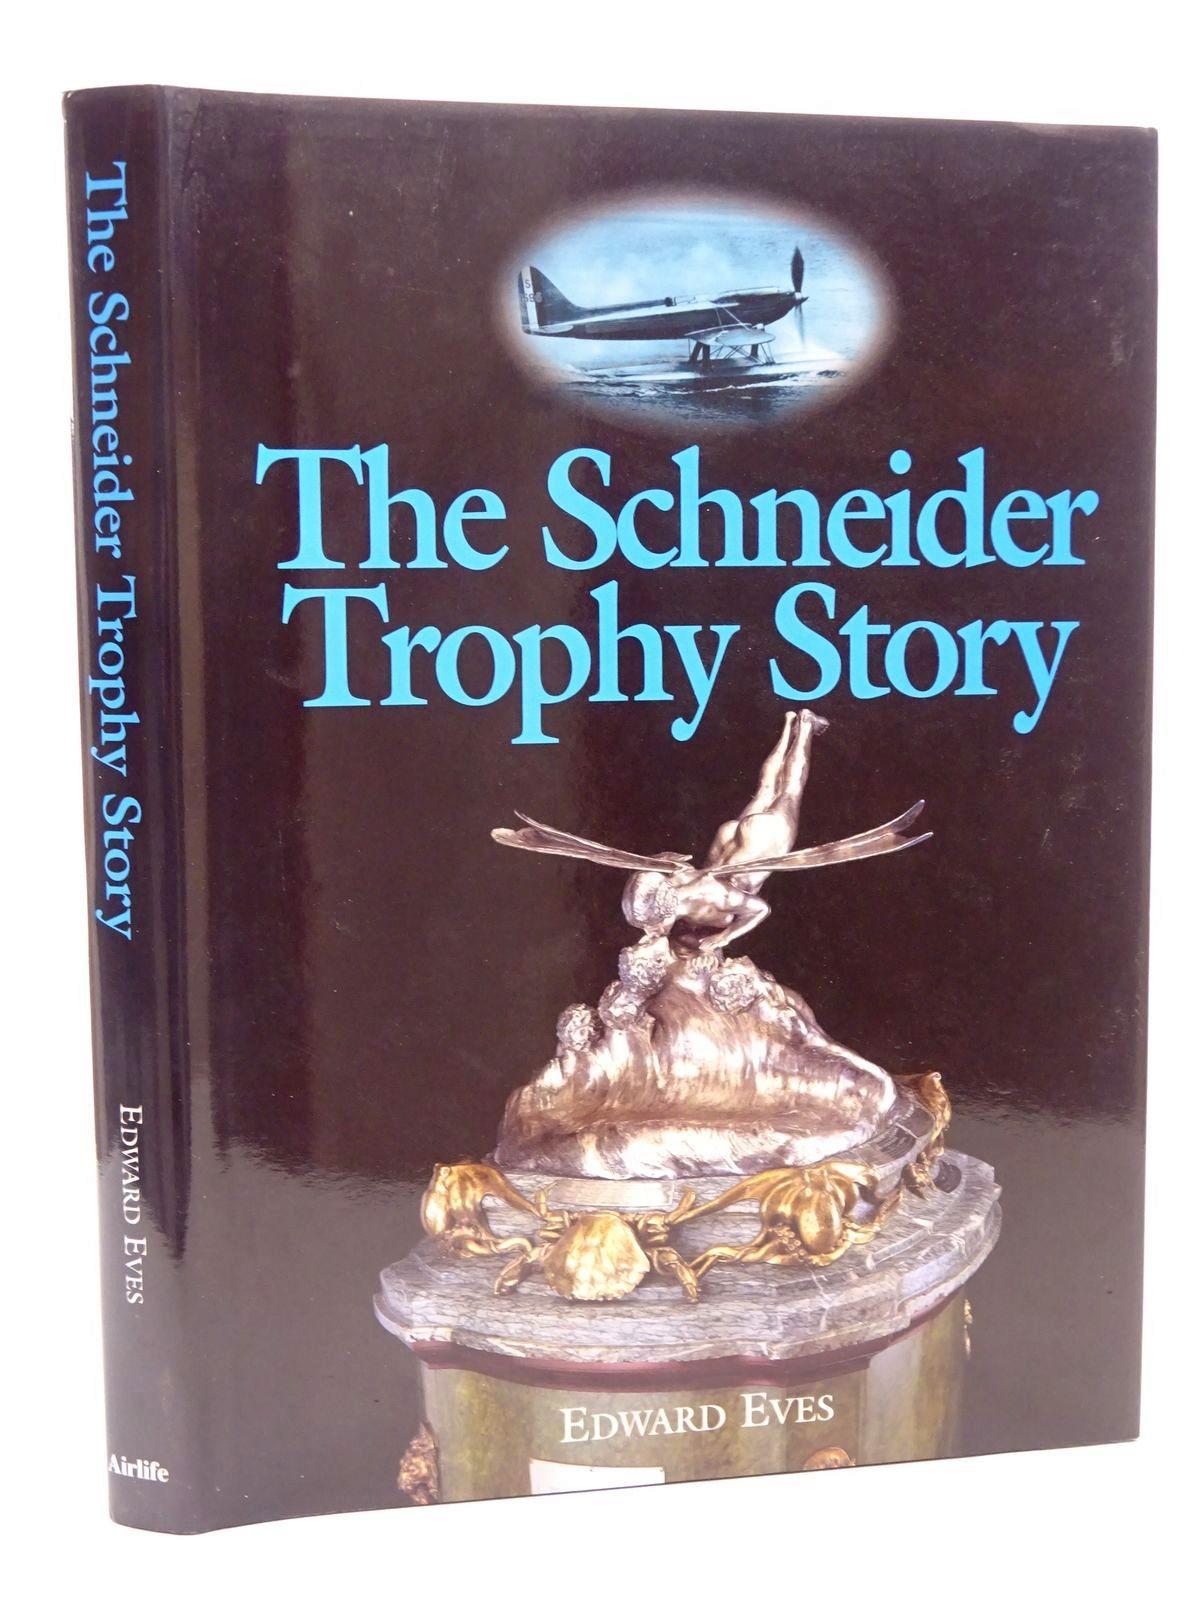 The Schneider Trophy Story